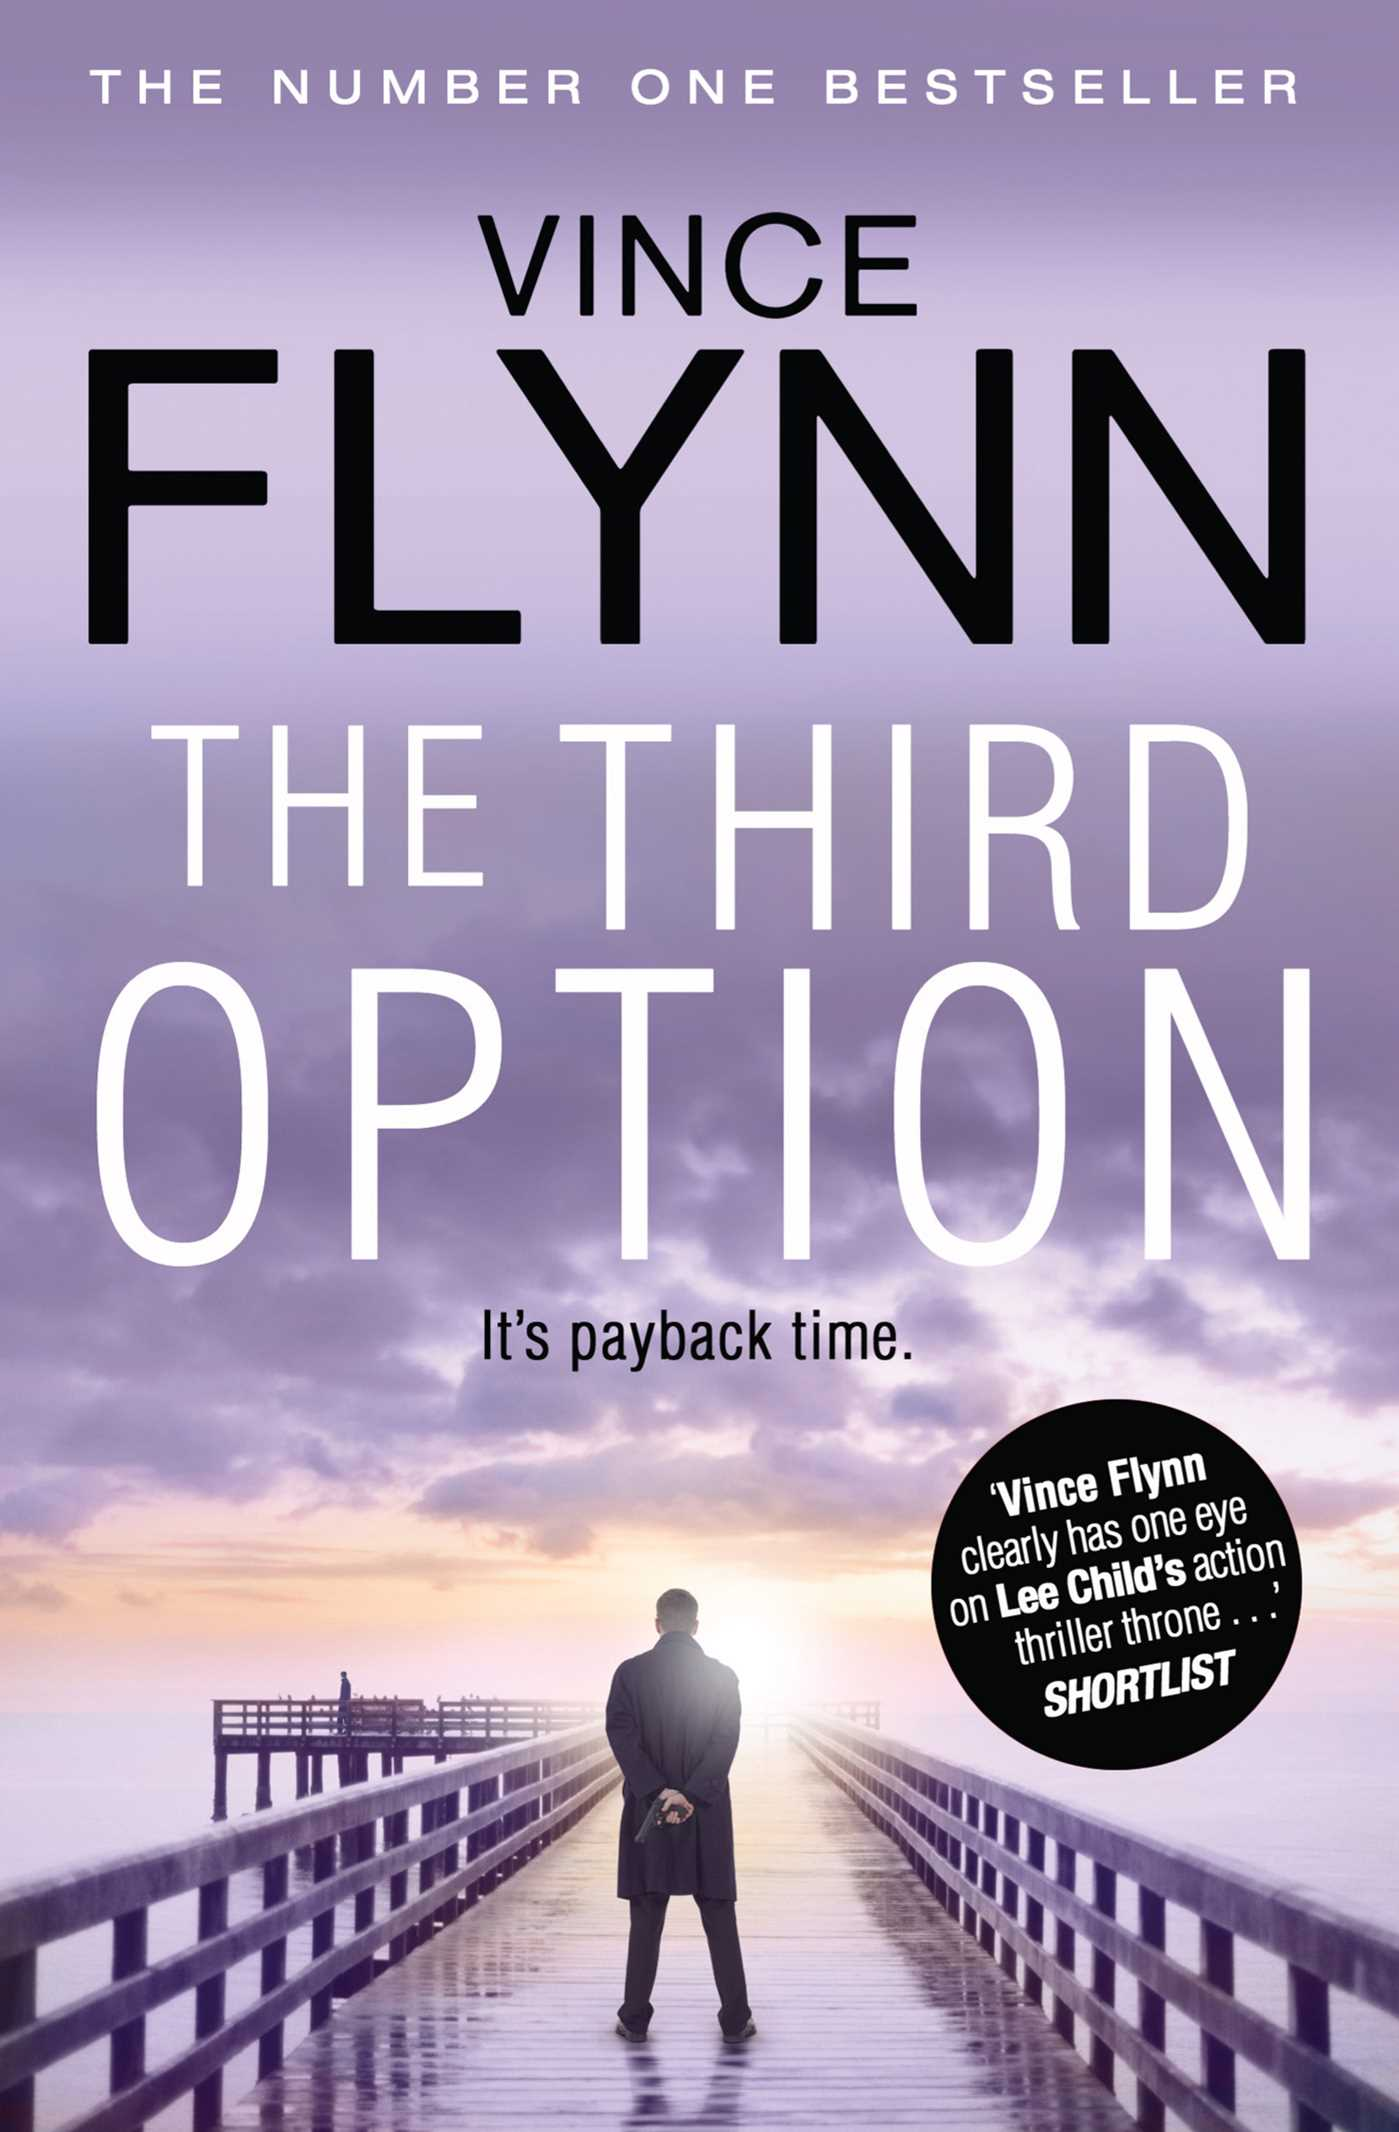 The third option vince flynn